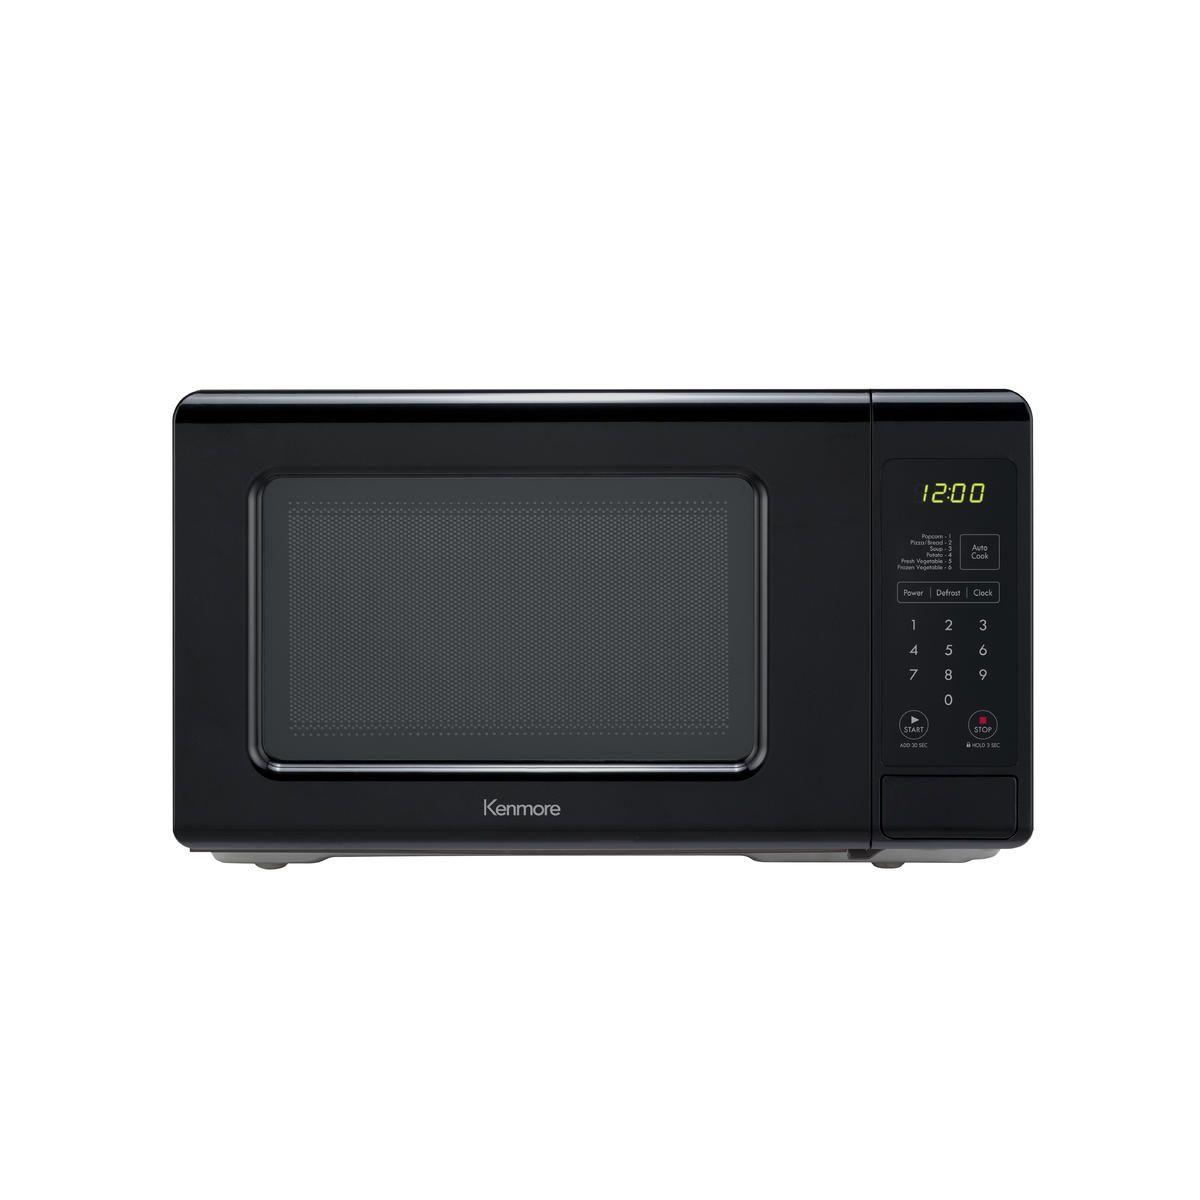 Kenmore 70719 0 7 Cu Ft Countertop Microwave Oven Black